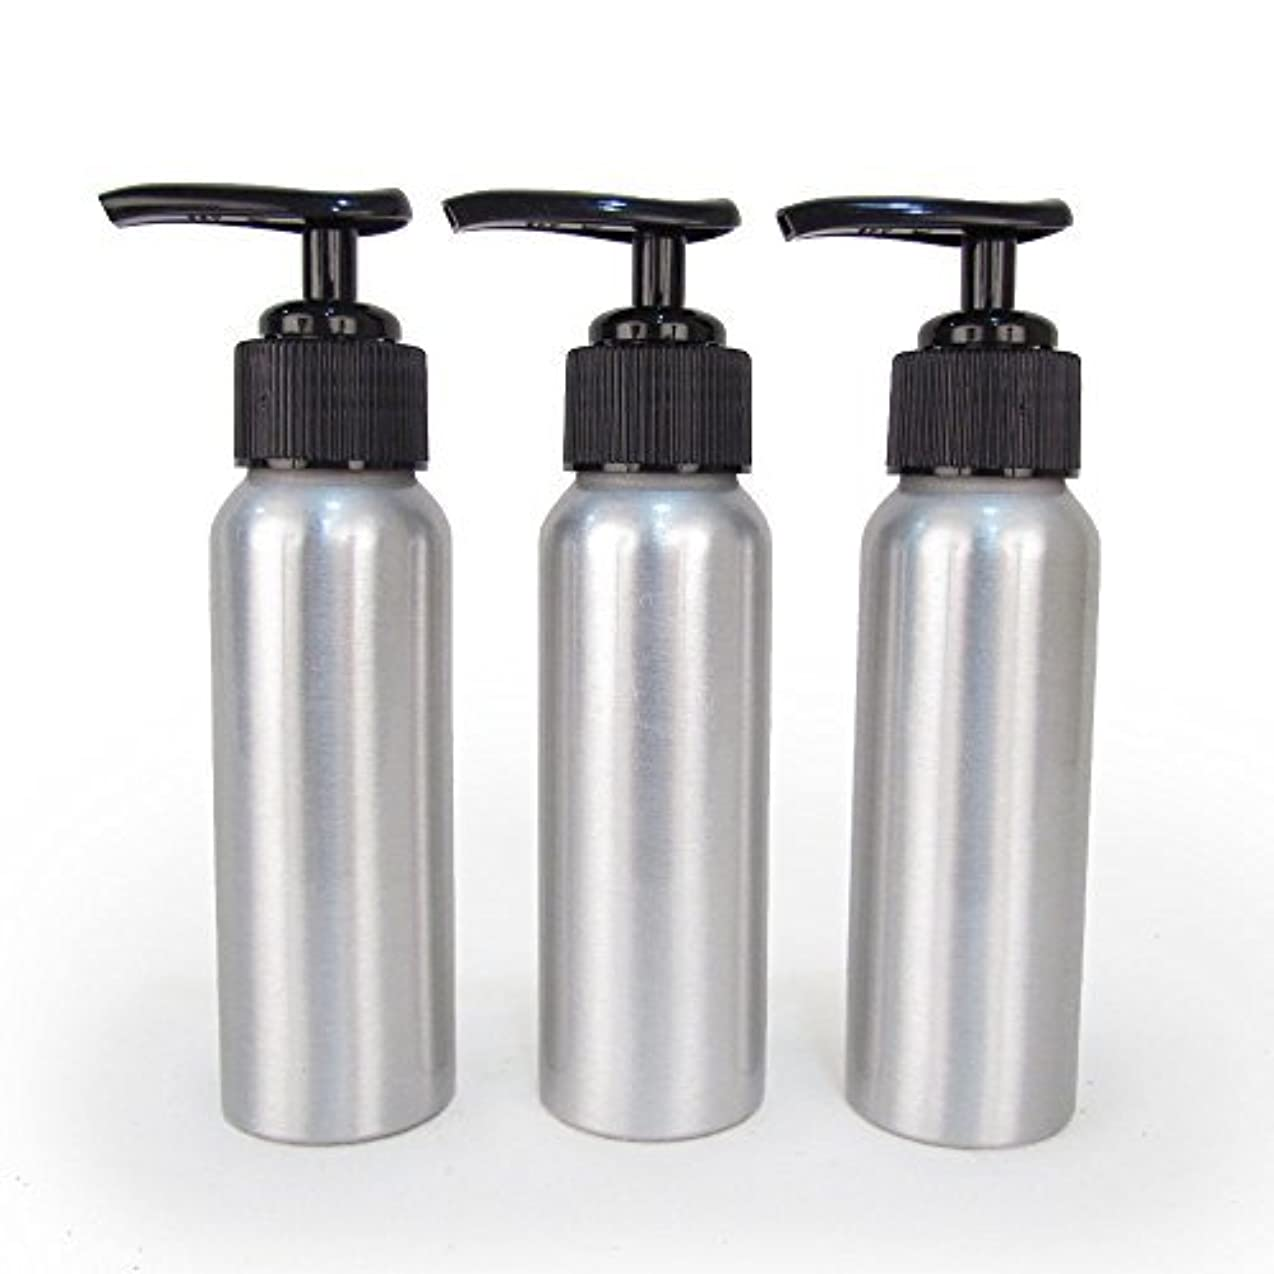 Set of 3 - Slender Brushed Aluminum 2.7 oz Pump Bottle for Essential Oil Products by Rivertree Life [並行輸入品]